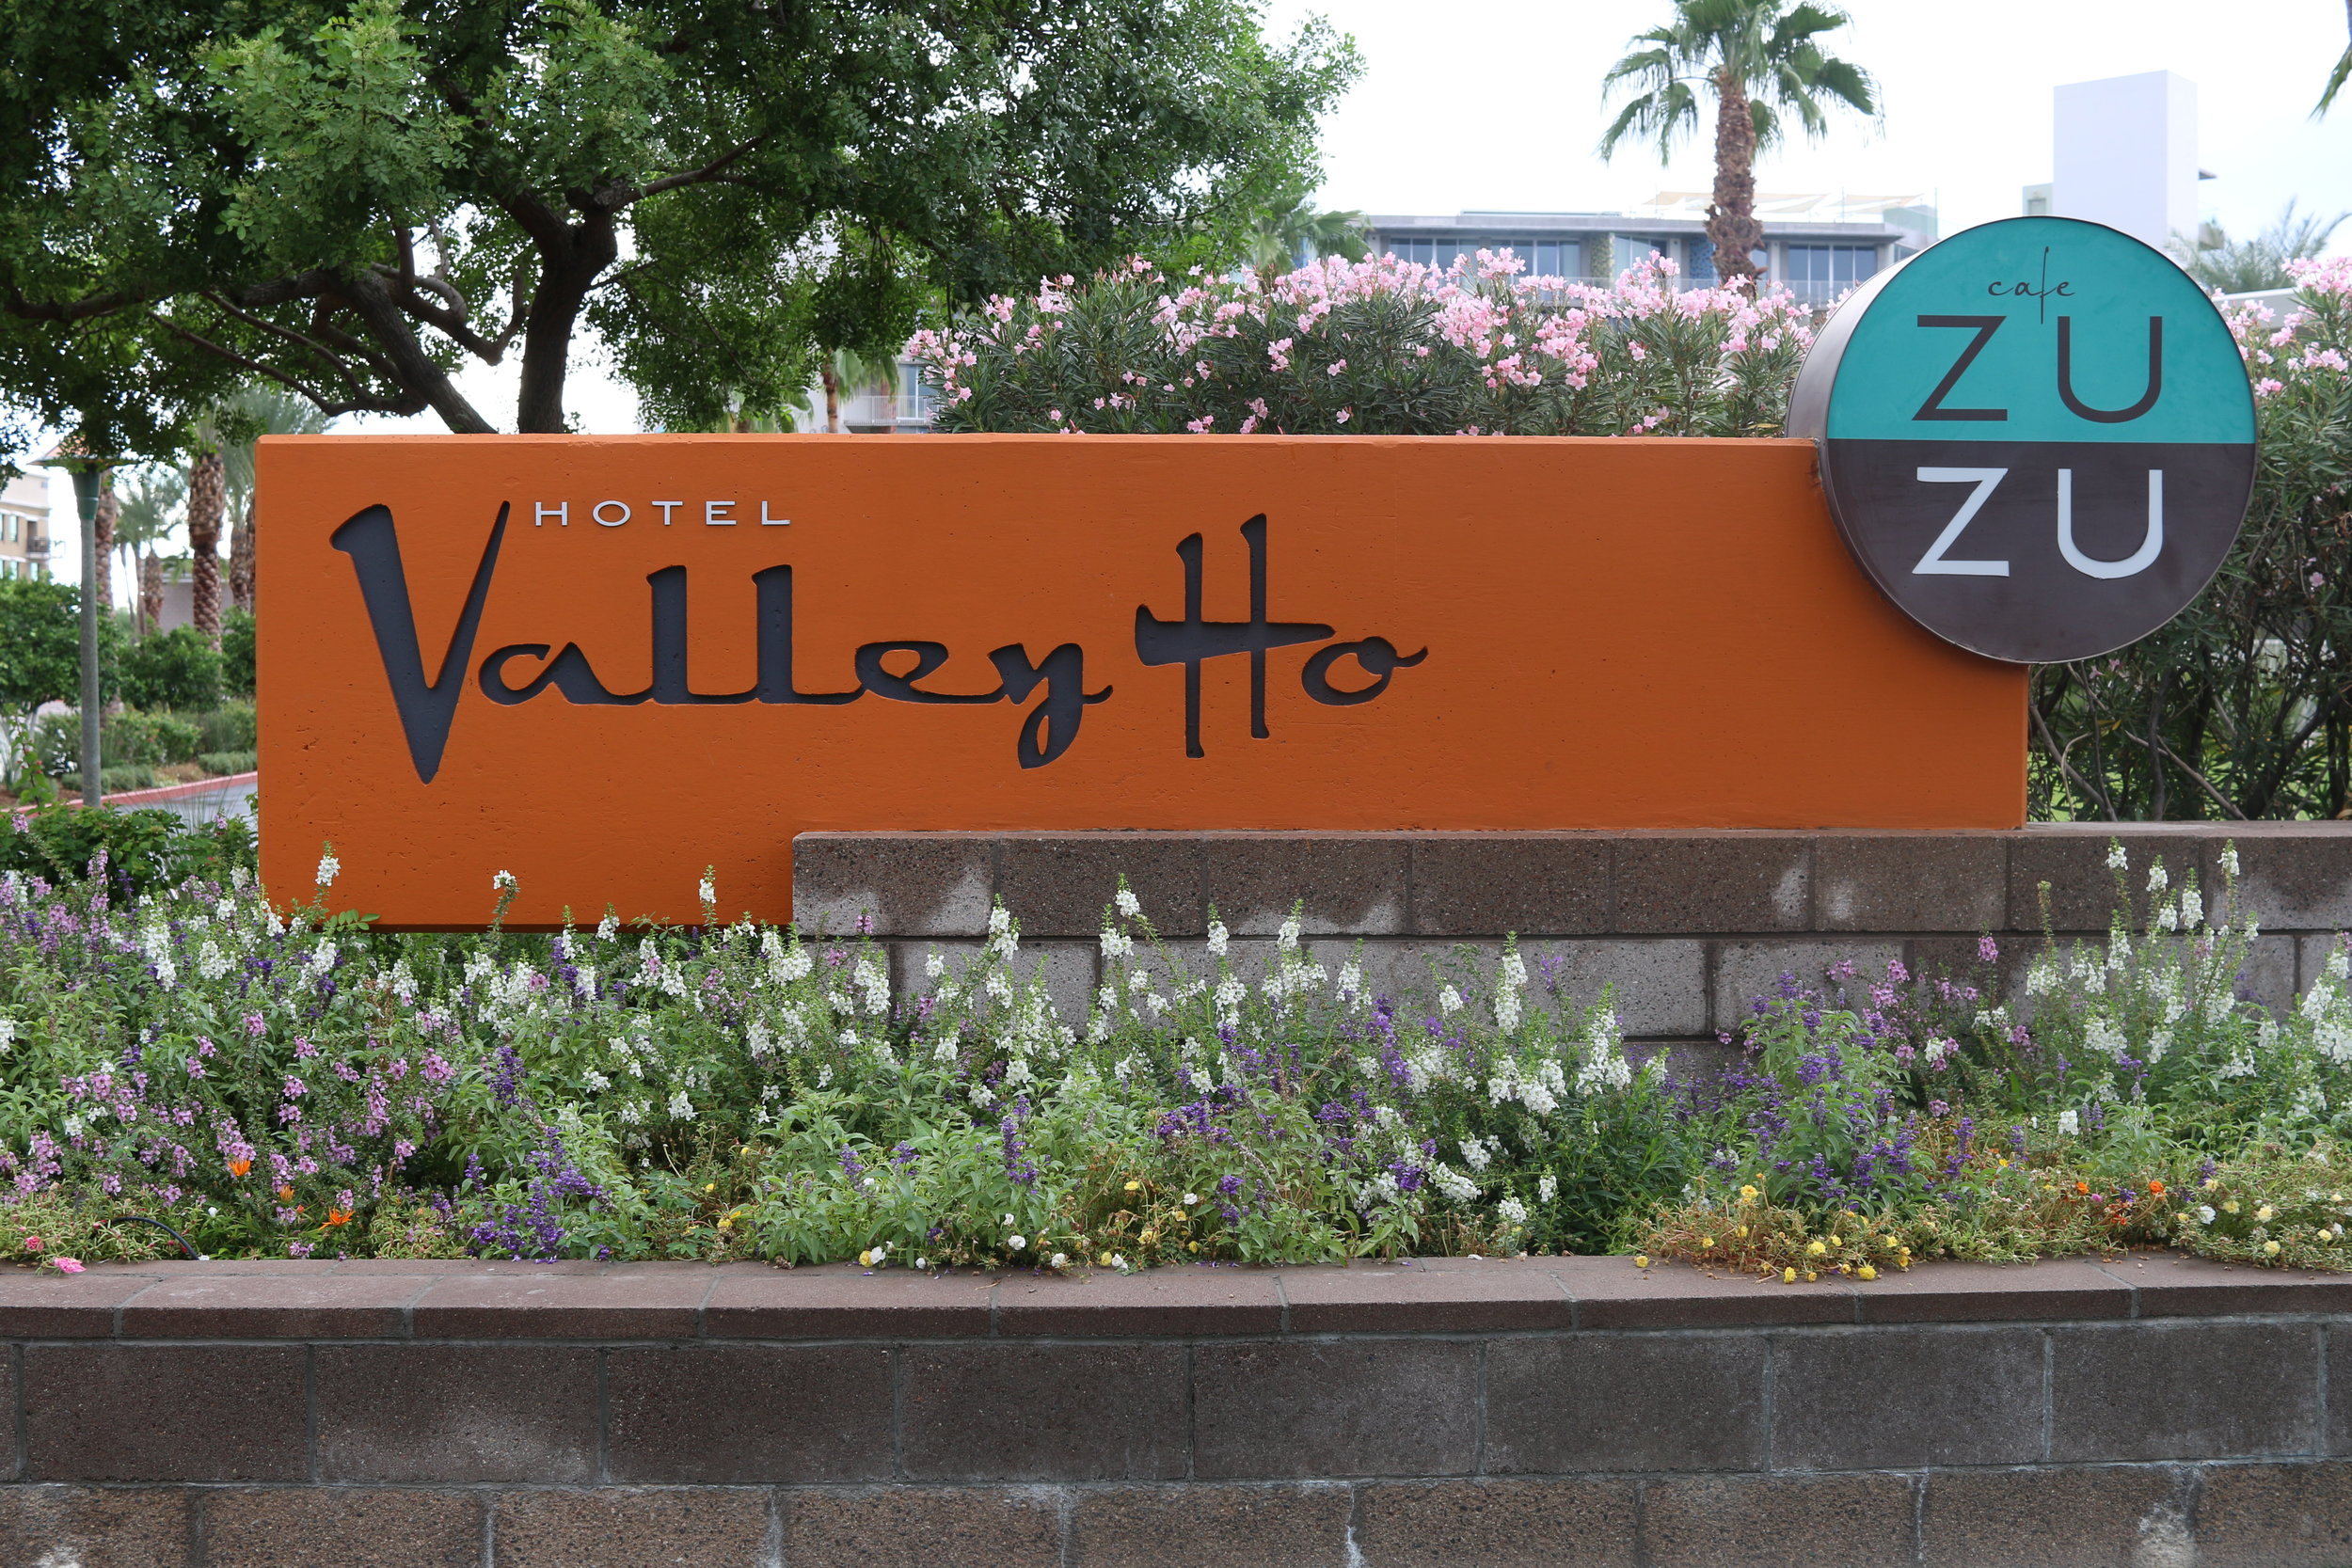 hotel-valley-ho-exterior-scottsdale-arizona